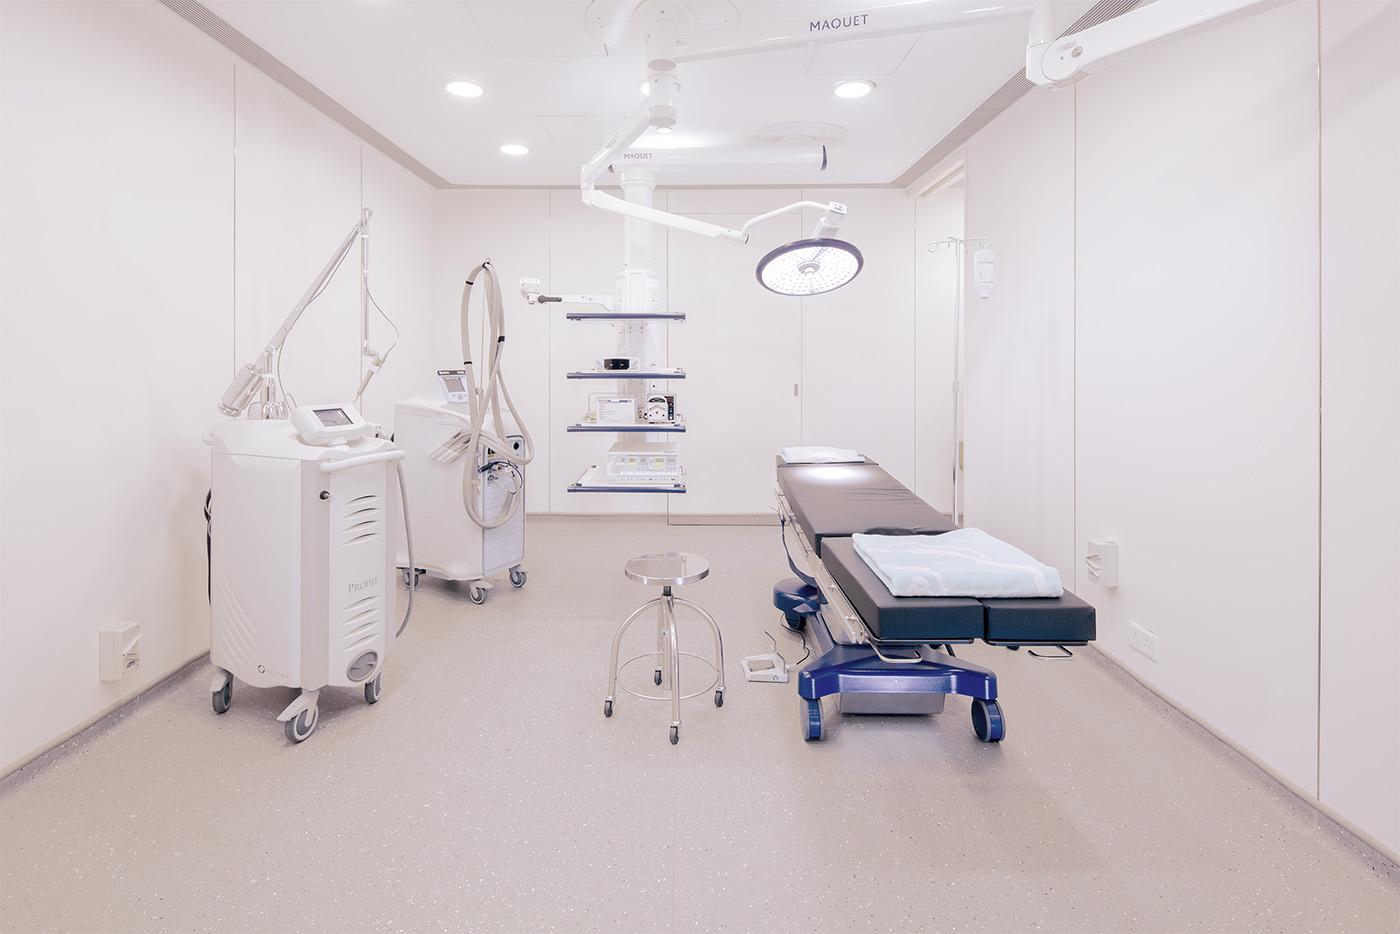 http://pedderclinic.hk/sc/wp-content/uploads/sites/3/facilities-03.jpg